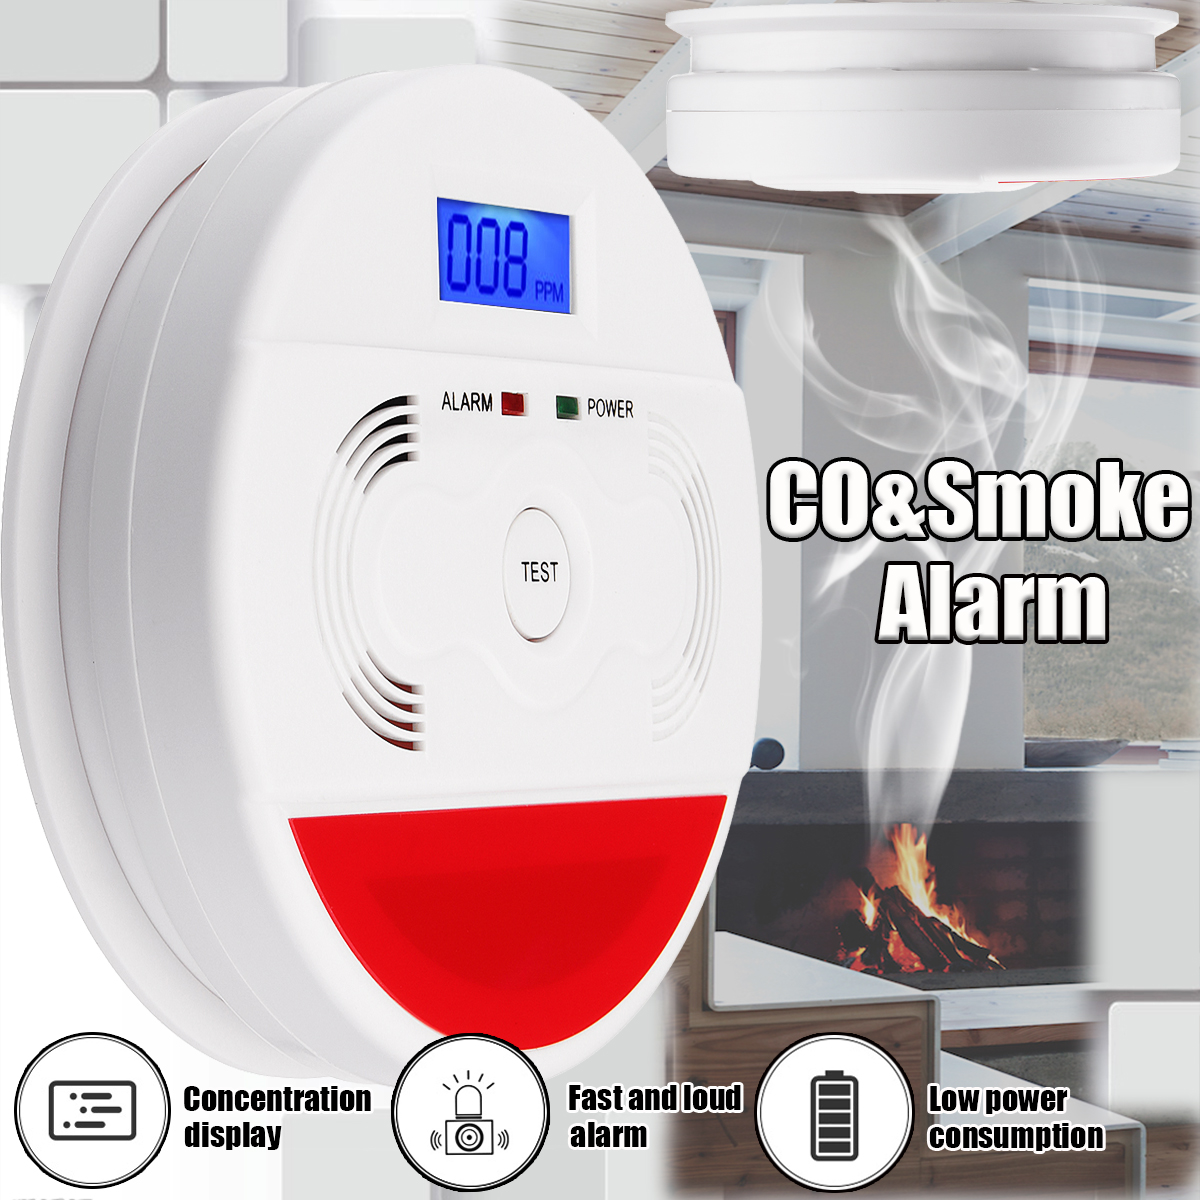 Security & Protection Carbon Monoxide Detectors Amiable 85db Led Display Smoke & Carbon Monoxide Detectors Home Security Safety Co Sensor Gas Poisoning Warning Alarm Detector